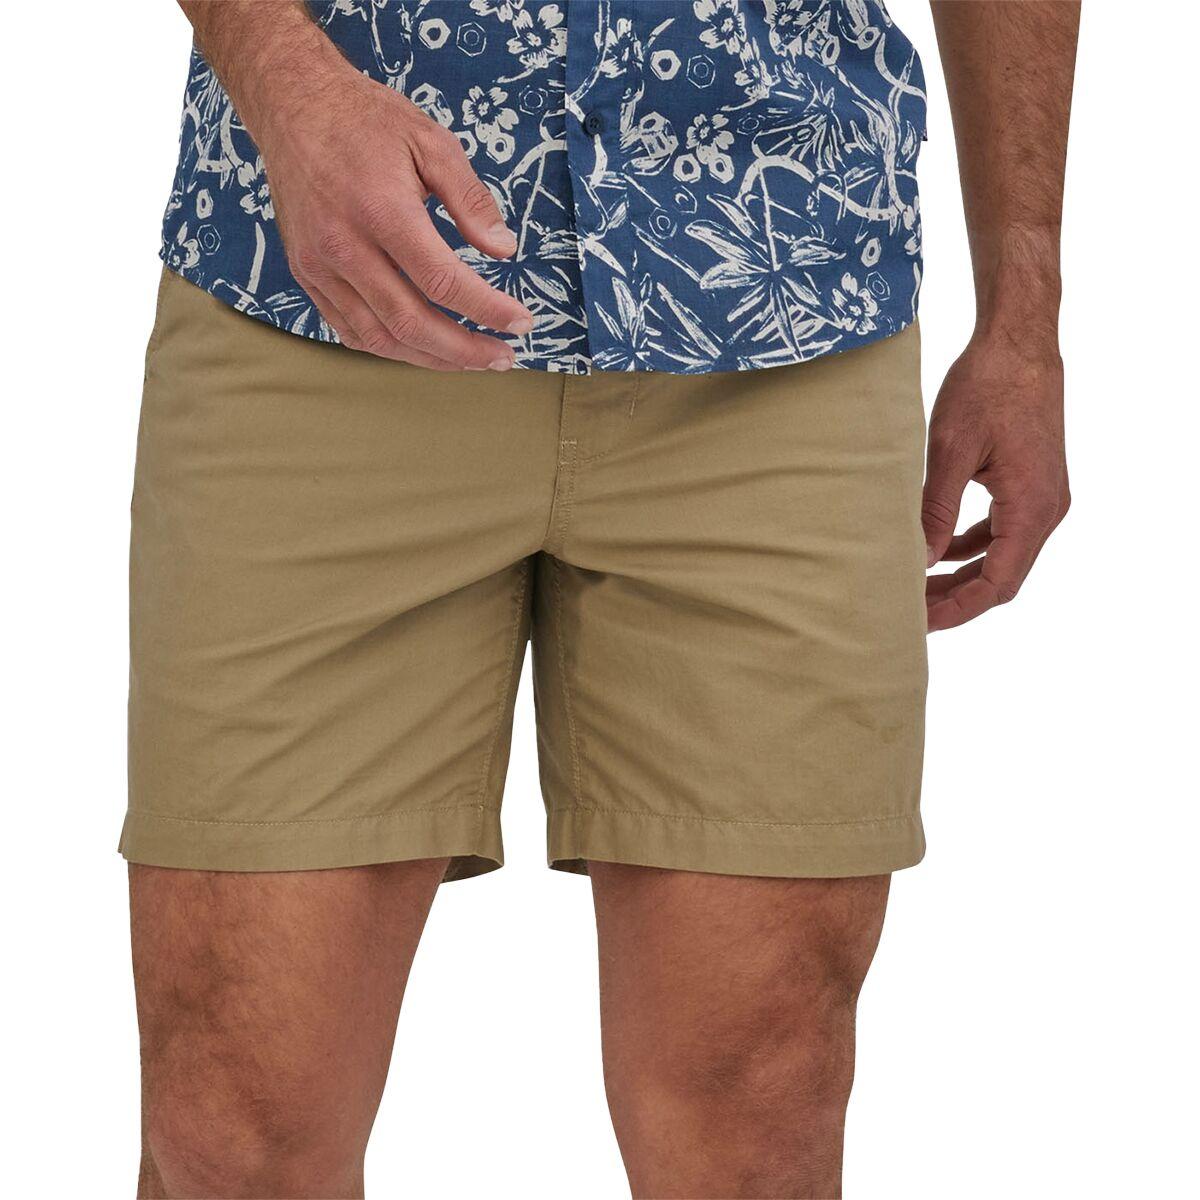 Pantalone Corto Uomo Ms LW all-Wear Hemp Volley Shorts Patagonia